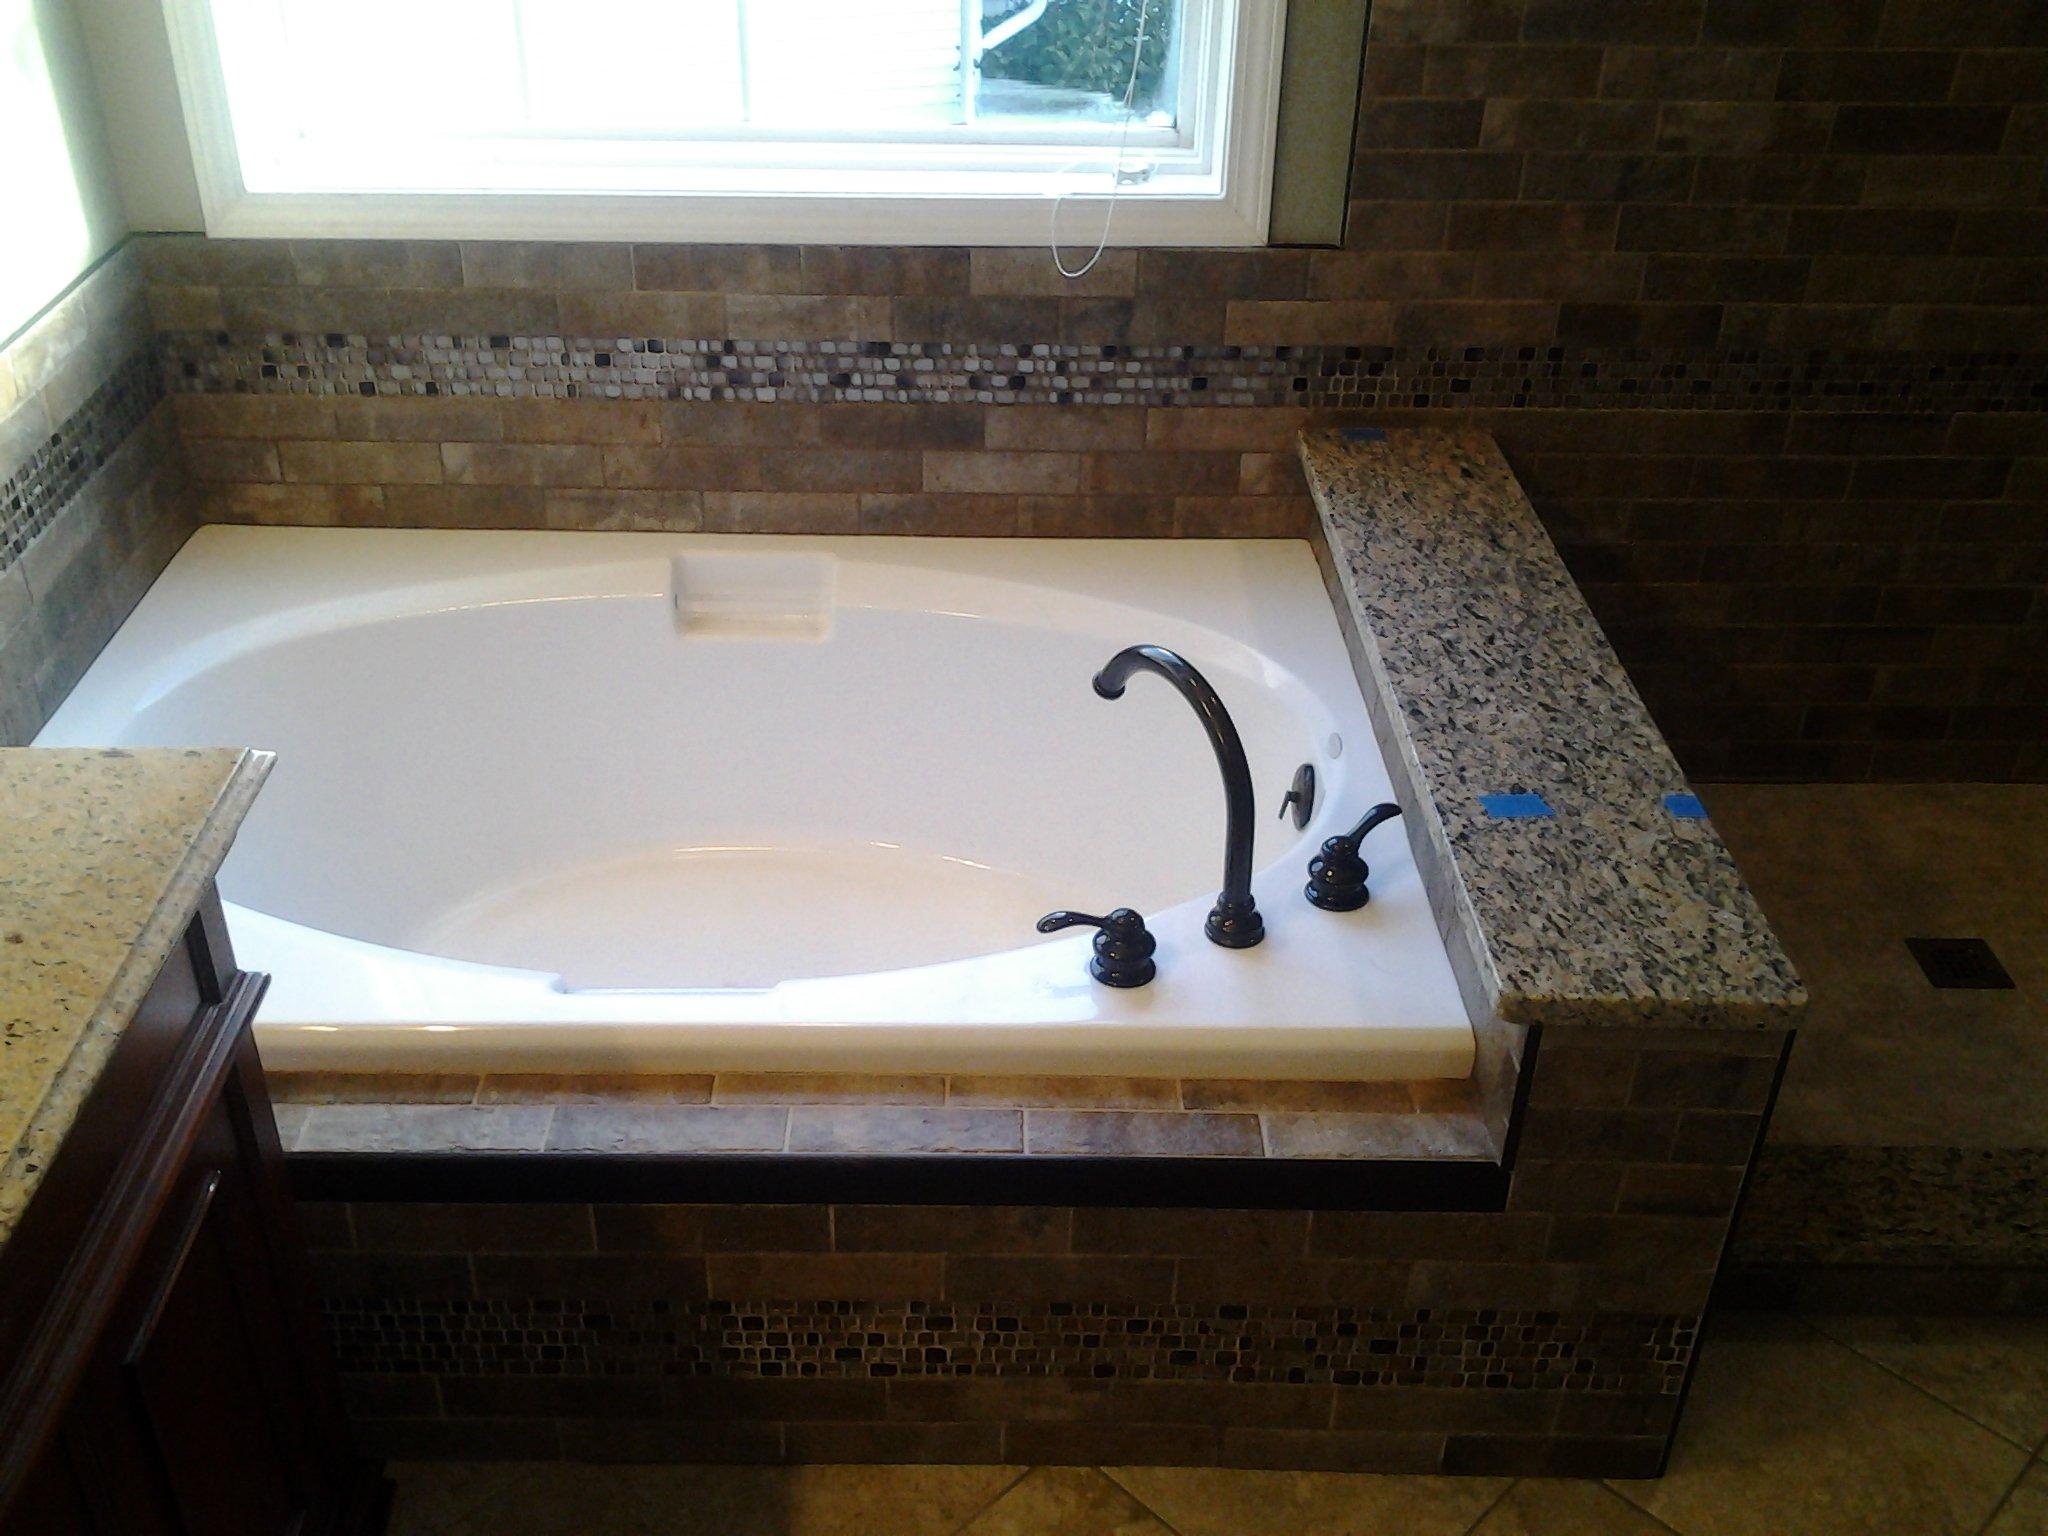 J R Floor Covering Saratoga Springs NY Bathroom Remodel - Bathroom remodel saratoga springs ny